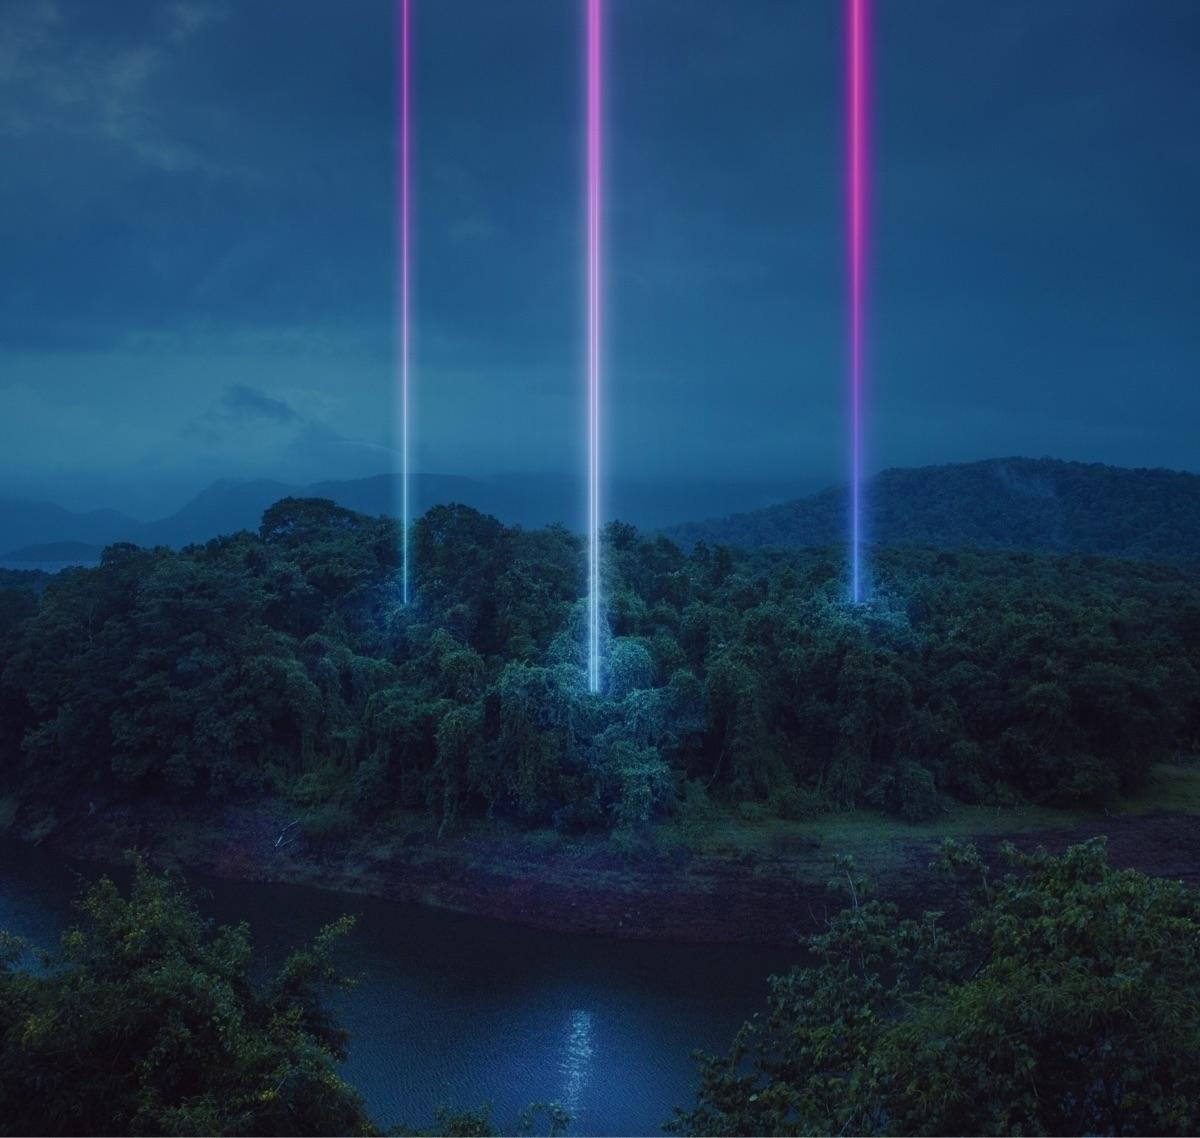 Dark paradise - digitalart, neon - riazhassan   ello